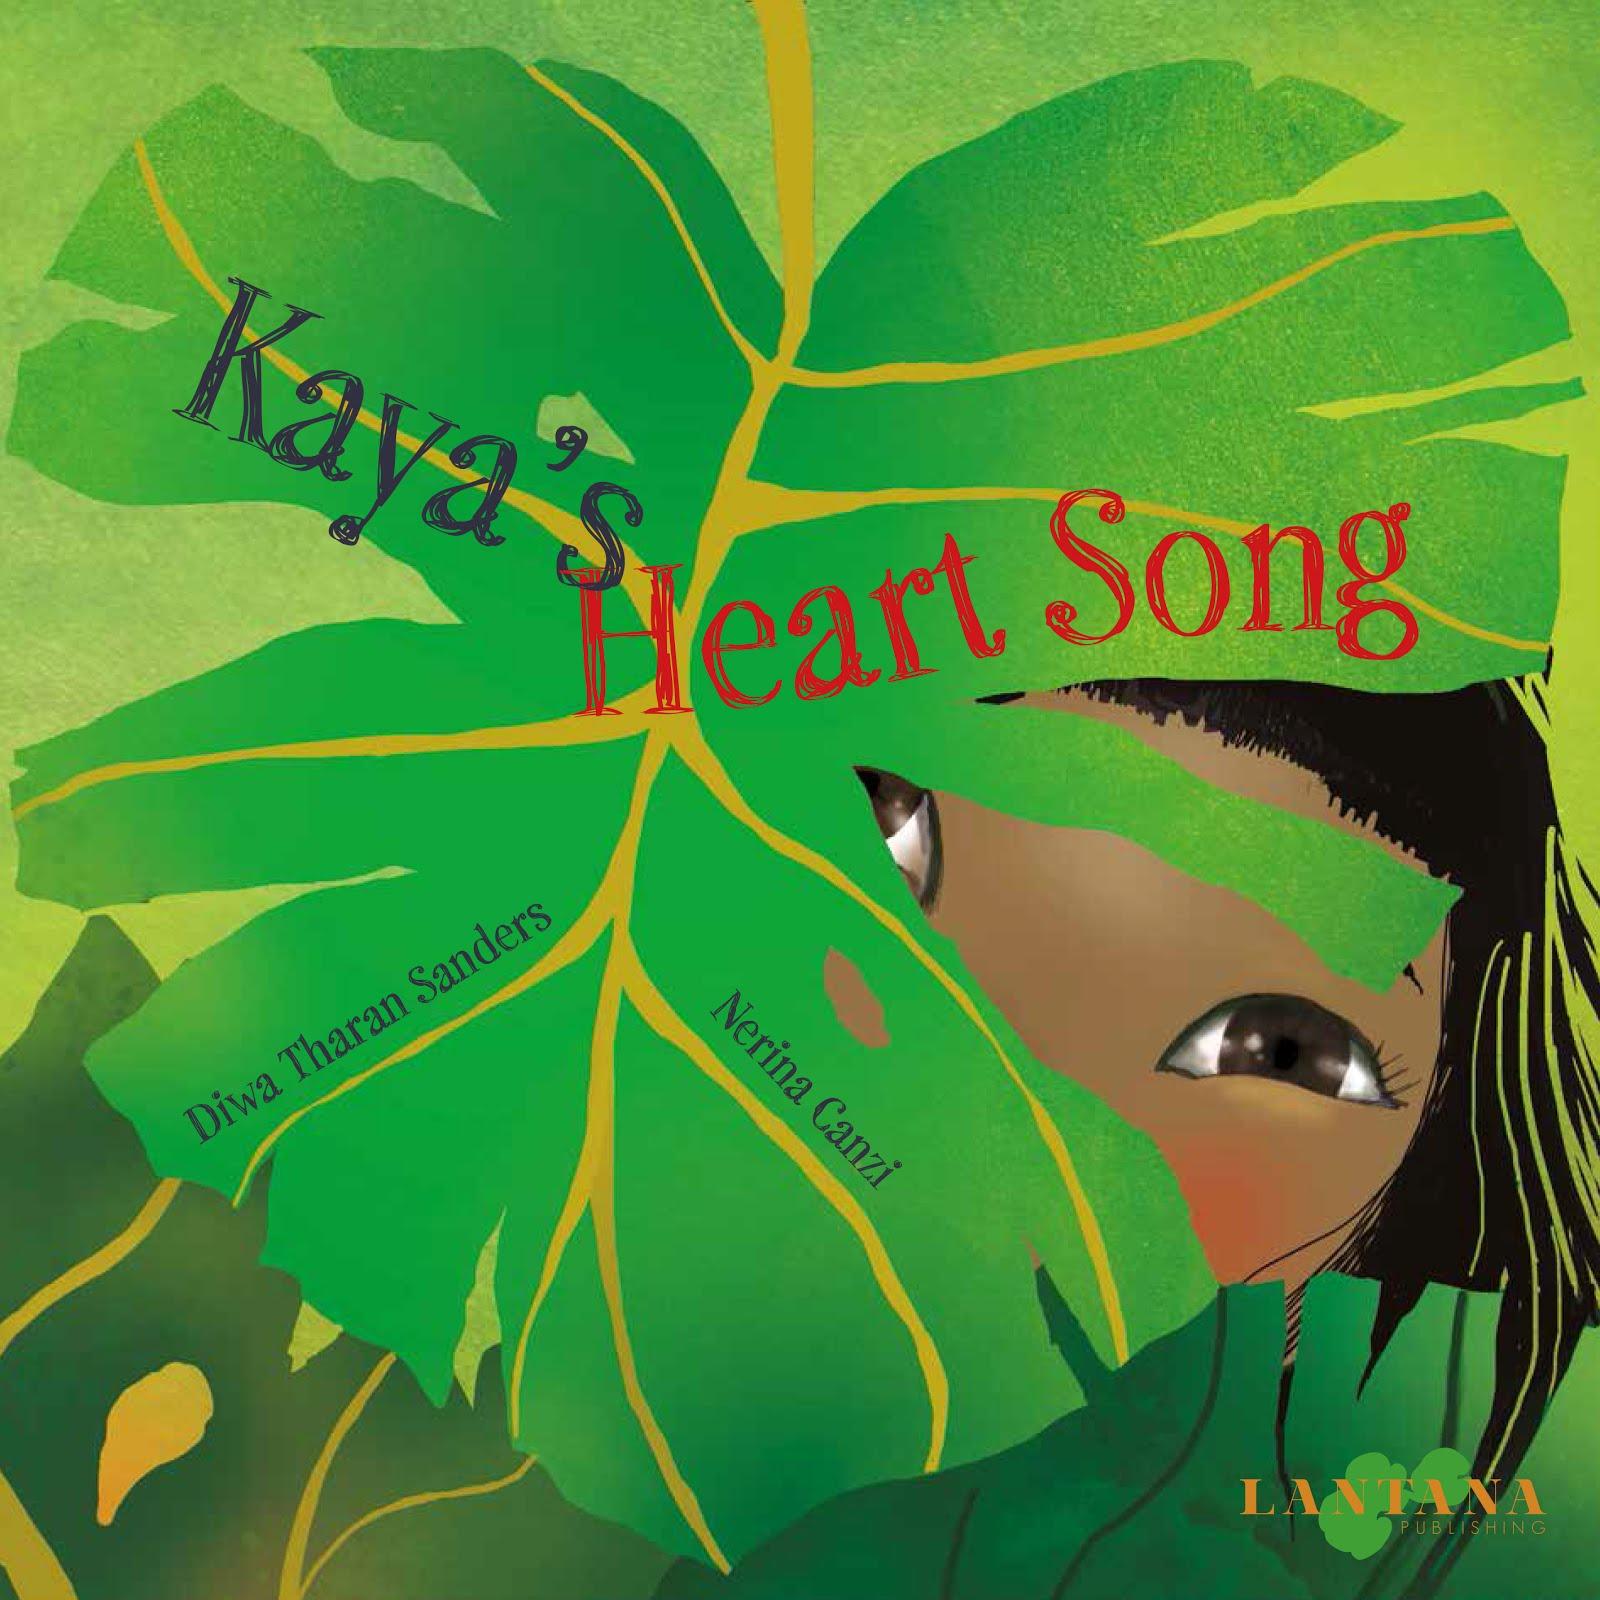 Kaya 's Heart Song